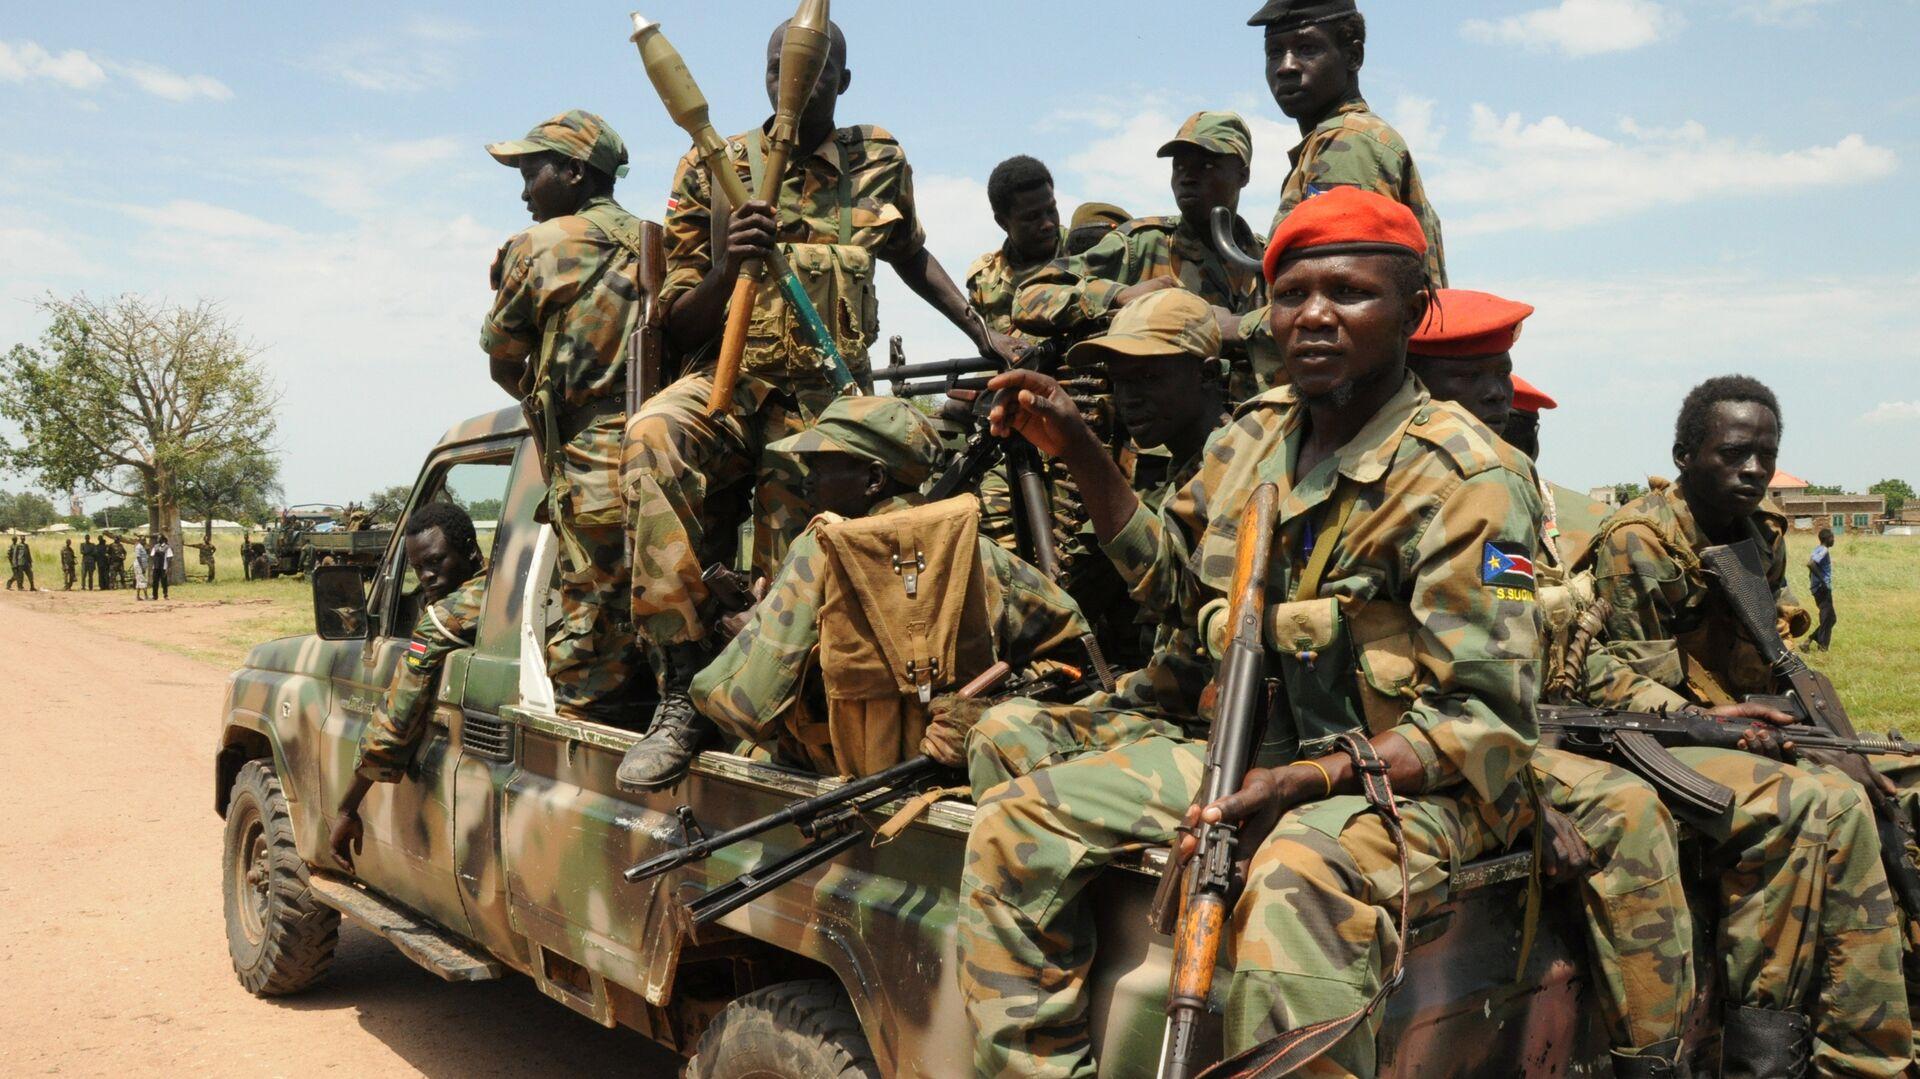 Sudanska oslobodilačka vojska Sudan People's Liberation Army (SPLA) - Sputnik Srbija, 1920, 26.09.2021